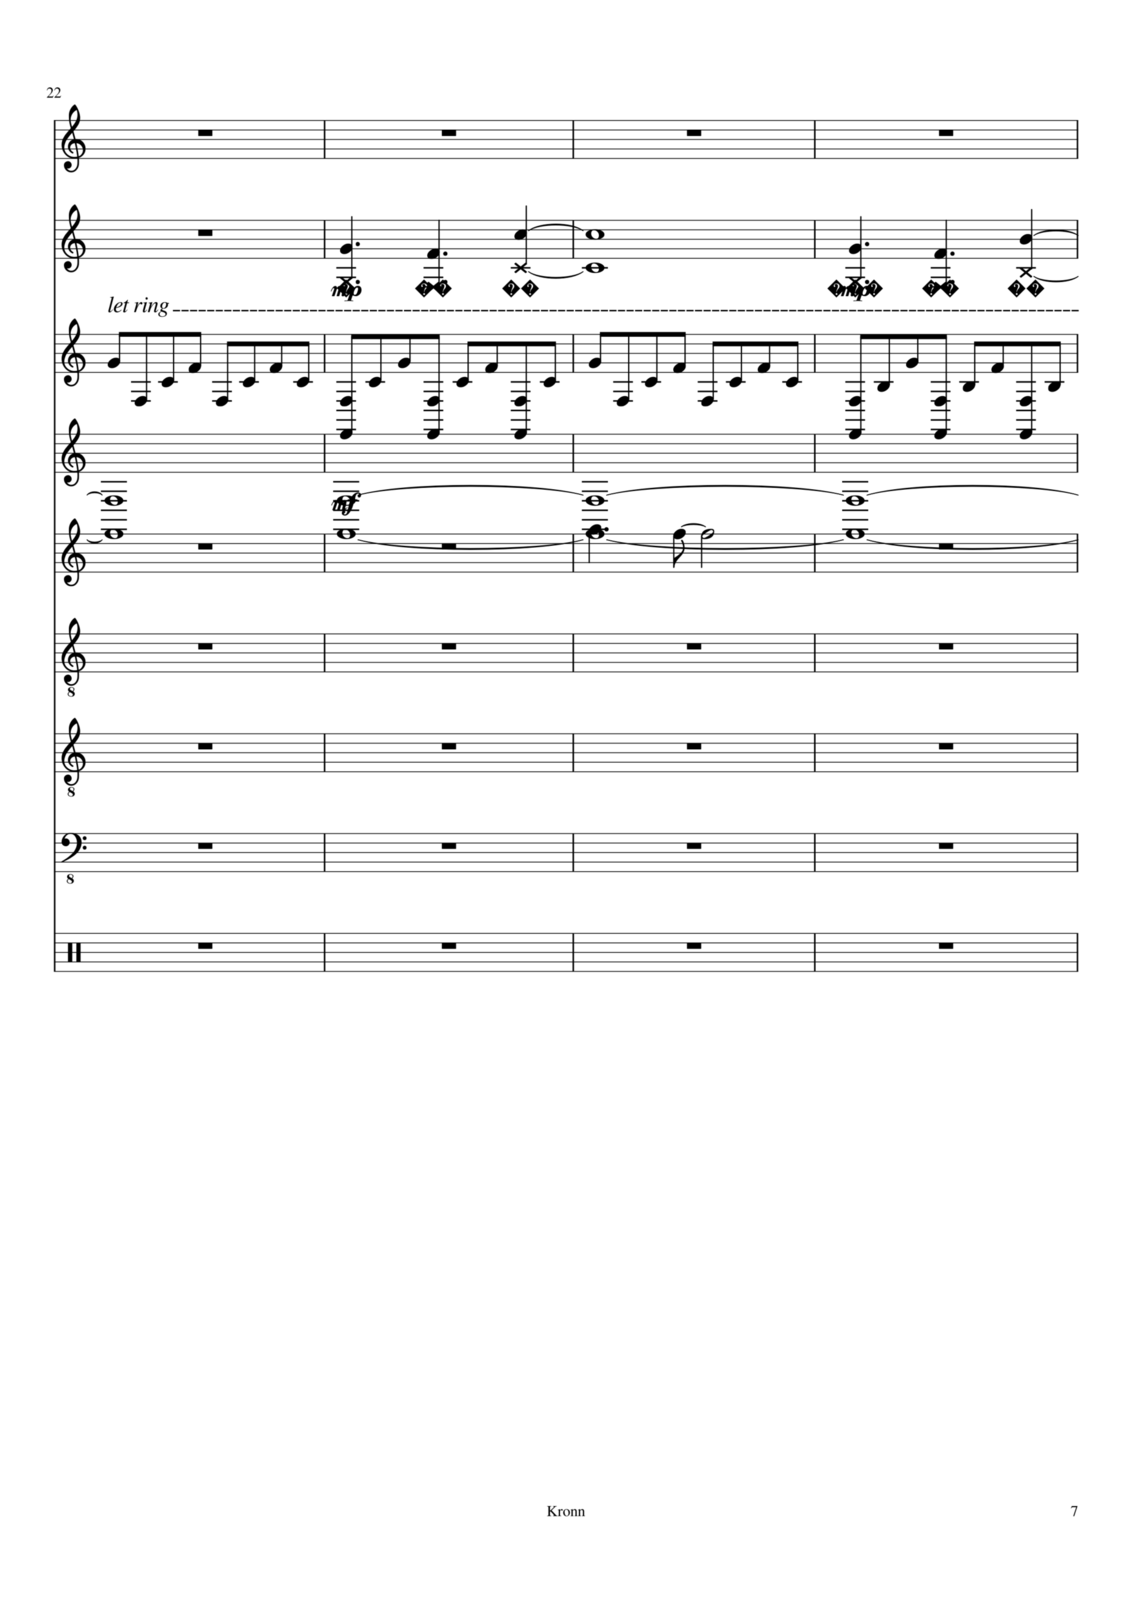 Okean Pustotyi slide, Image 7